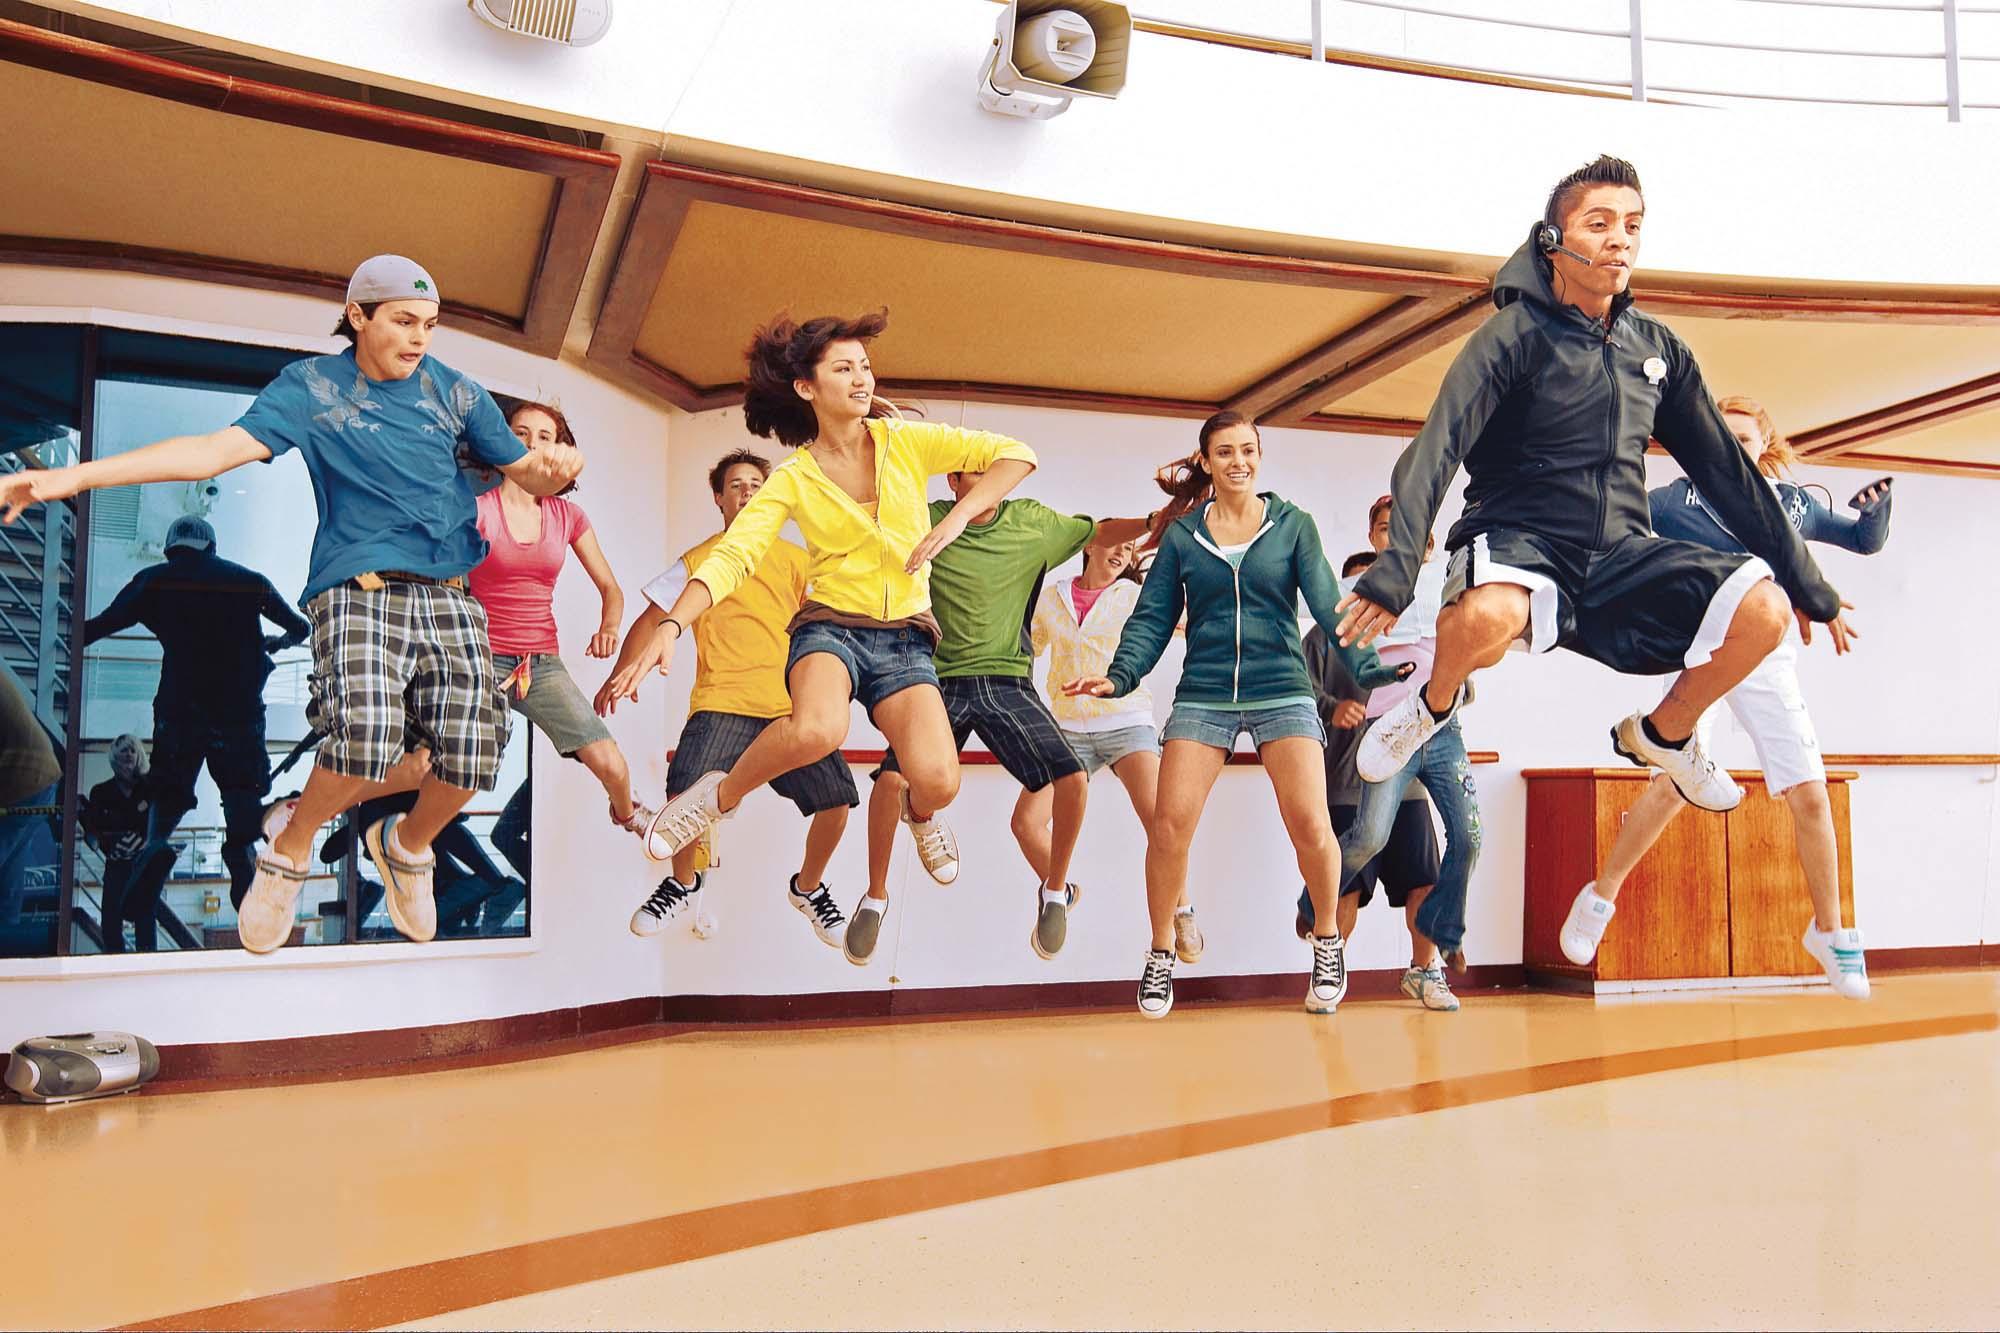 Family Cruises On Princess Cruises Cruiseable - Cruise ships for teens